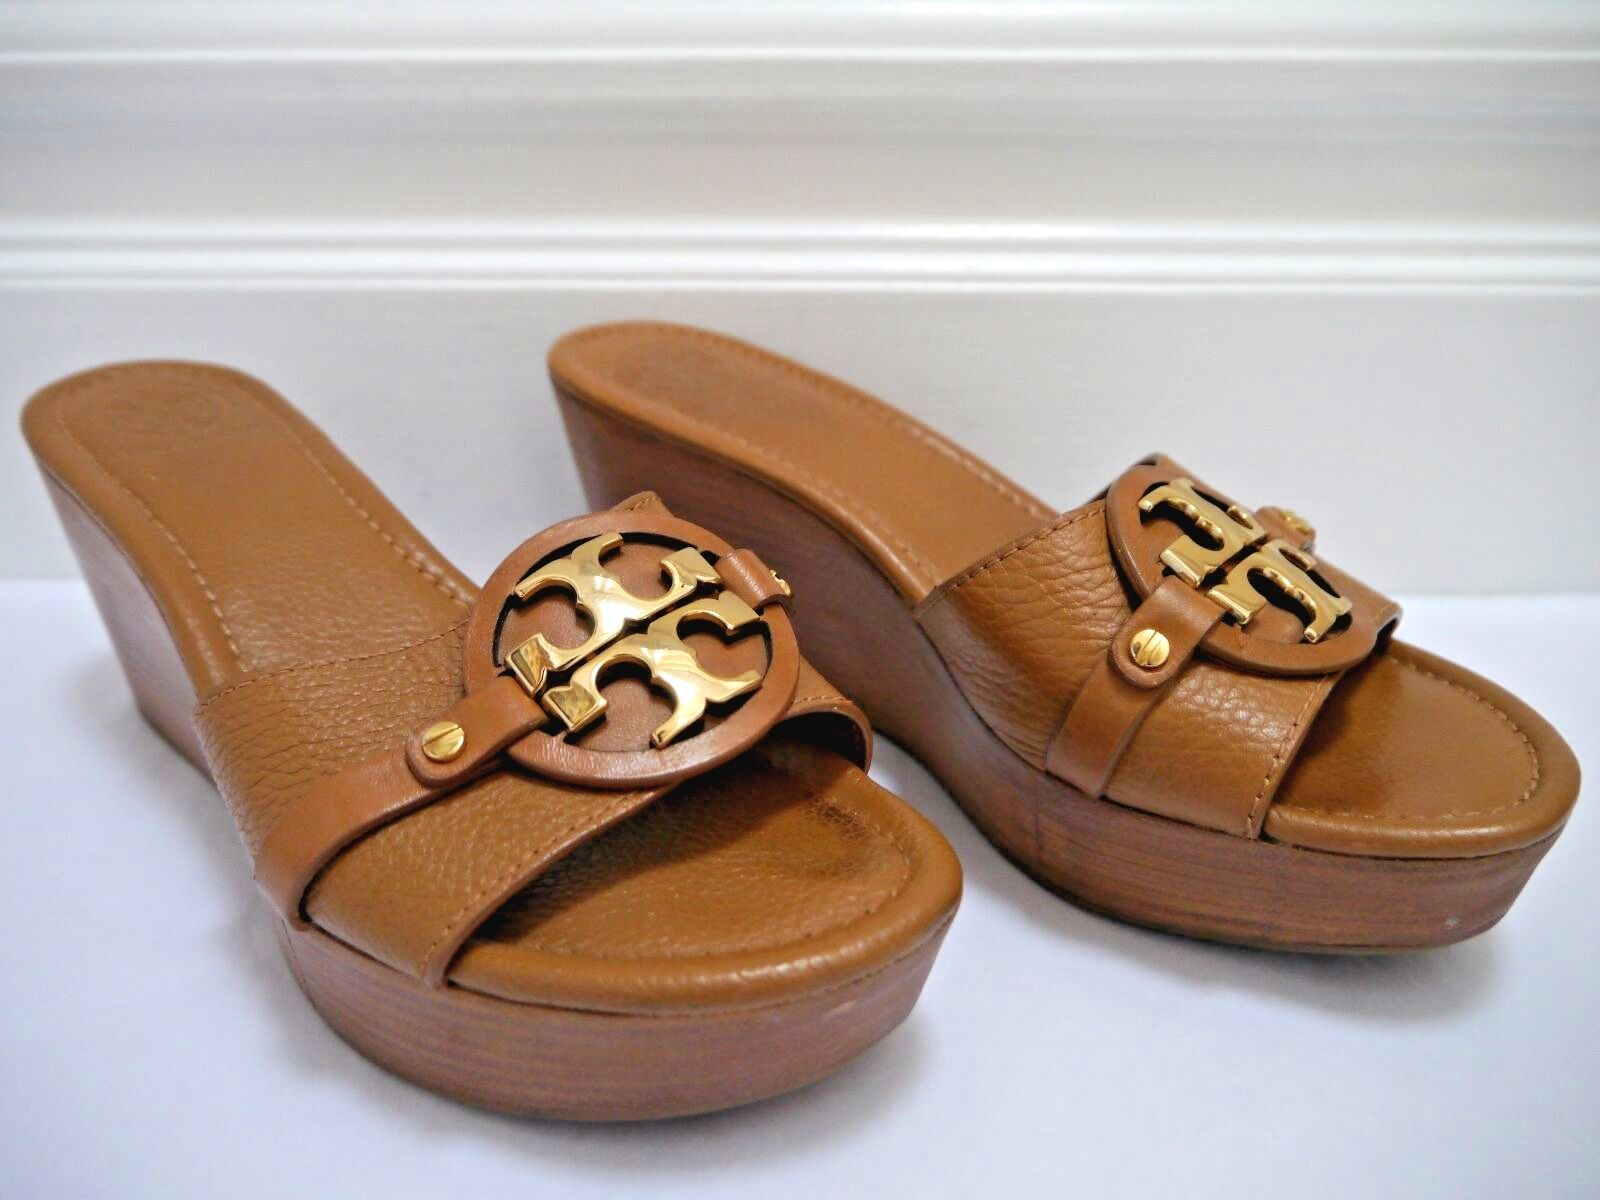 TORY BURCH Patti light Braun leather gold 8.5 logo wedge sandals size 8.5 gold 76c4df